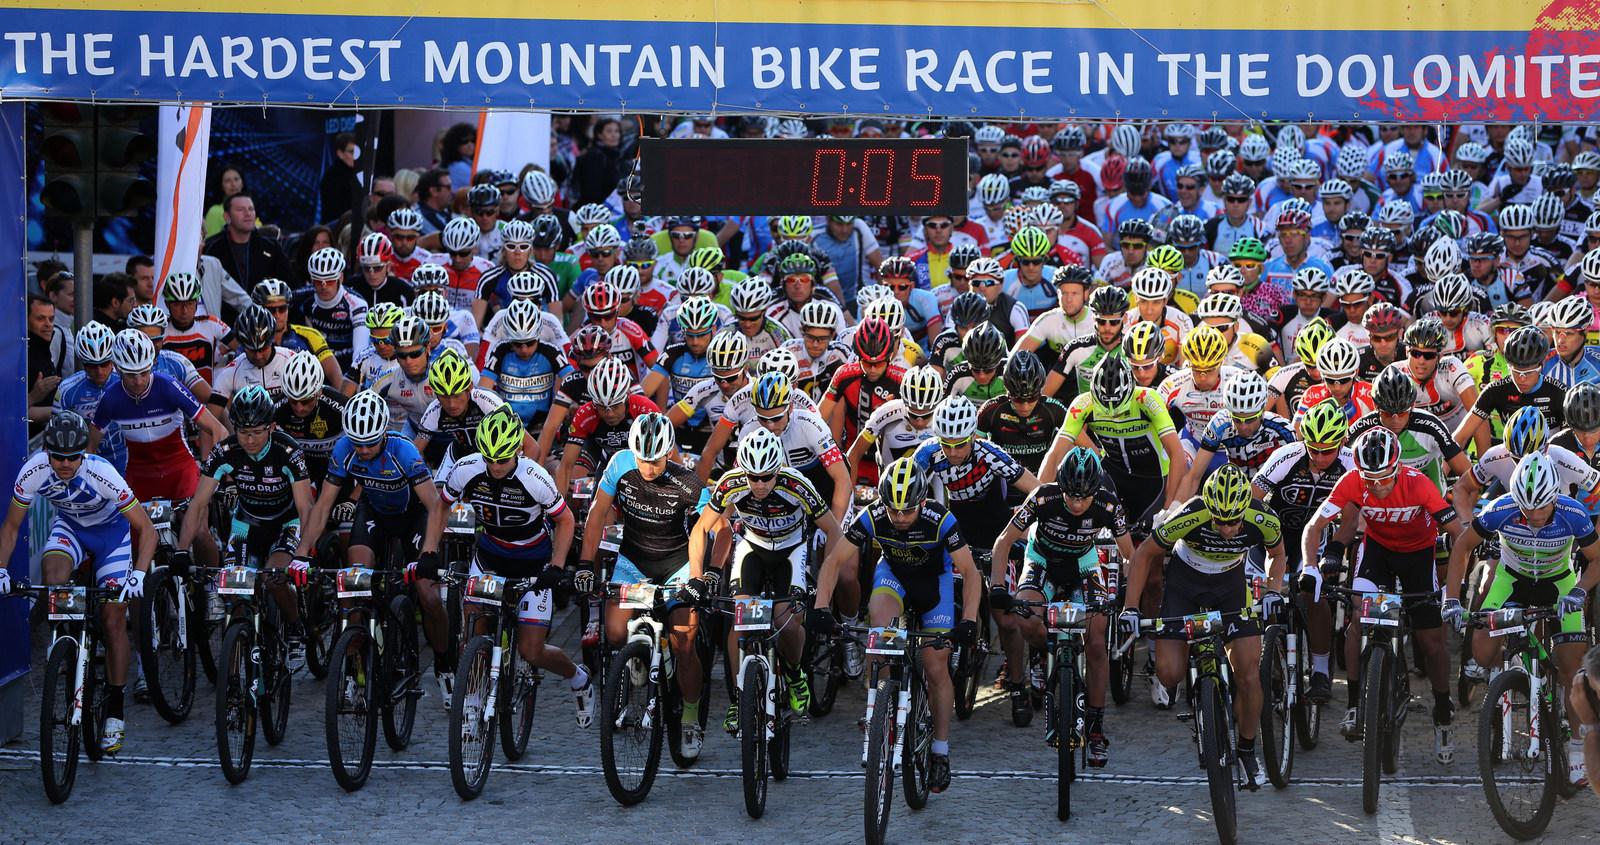 Südtirol Dolomiti Superbike 2013, il bilancio finale